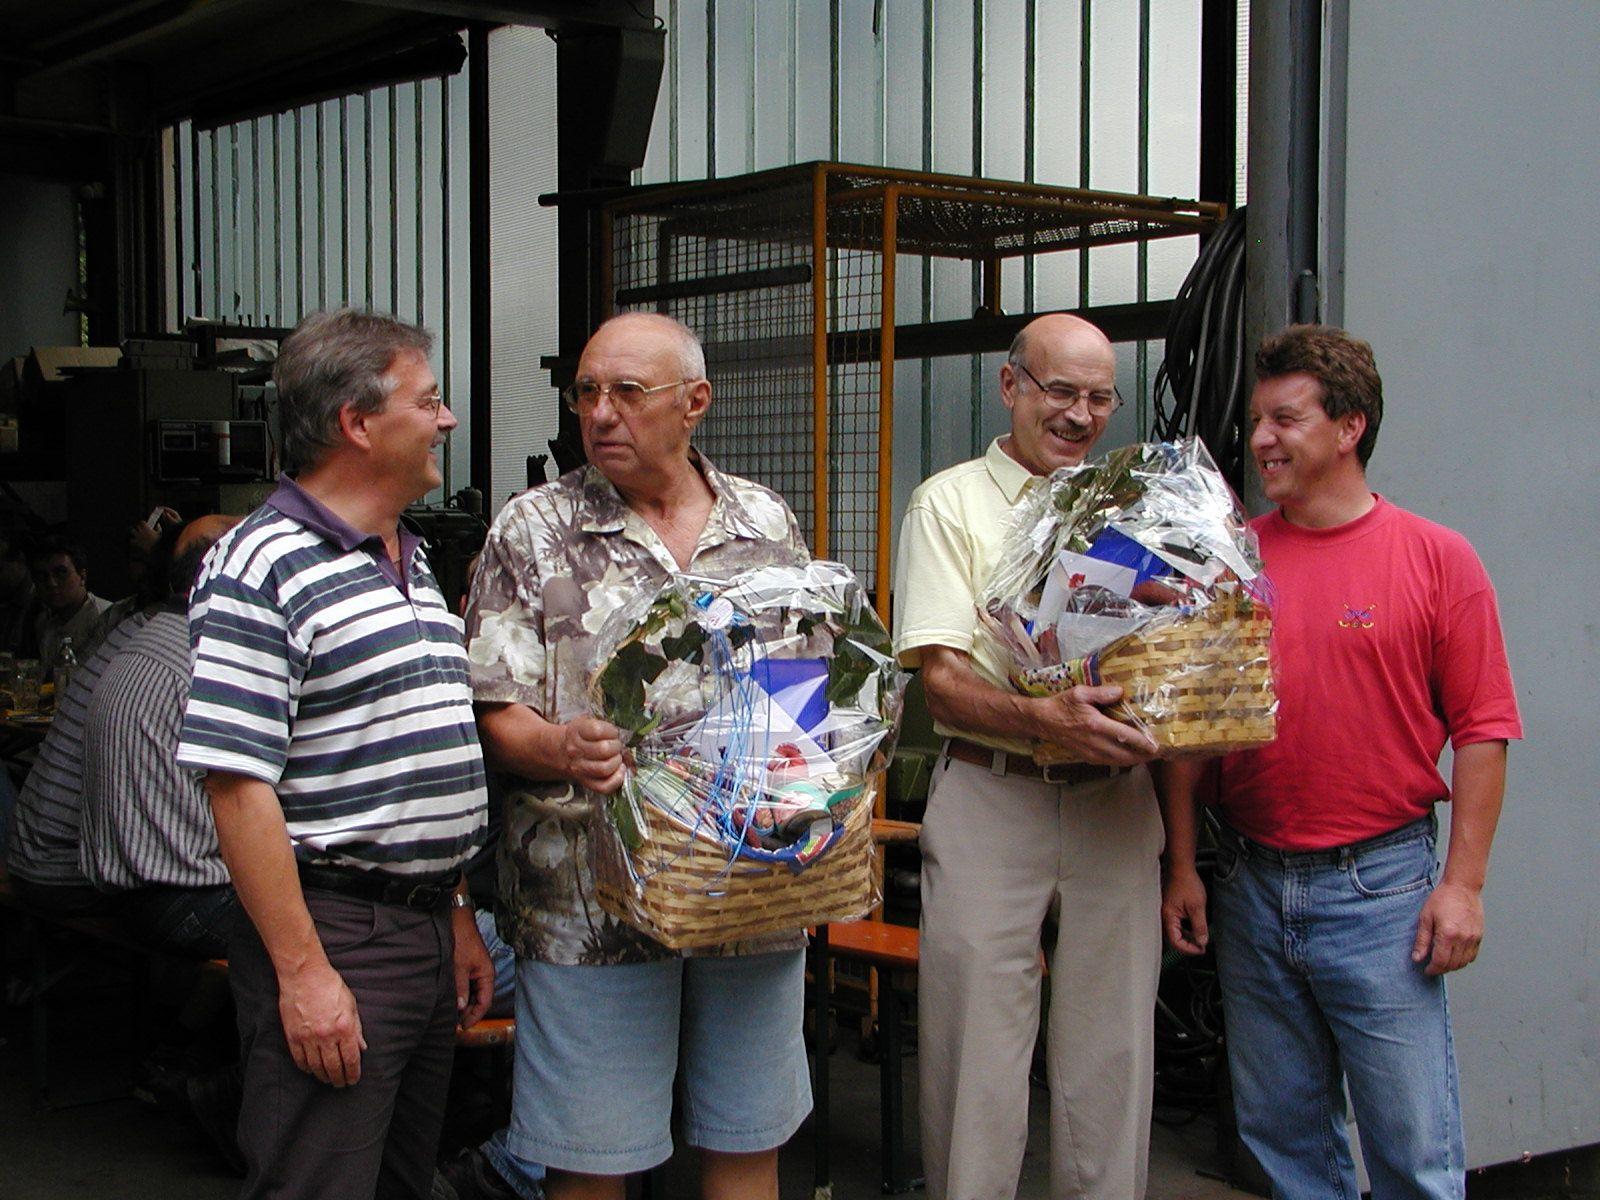 Verabschiedung in den wohlverdienten Ruhestand